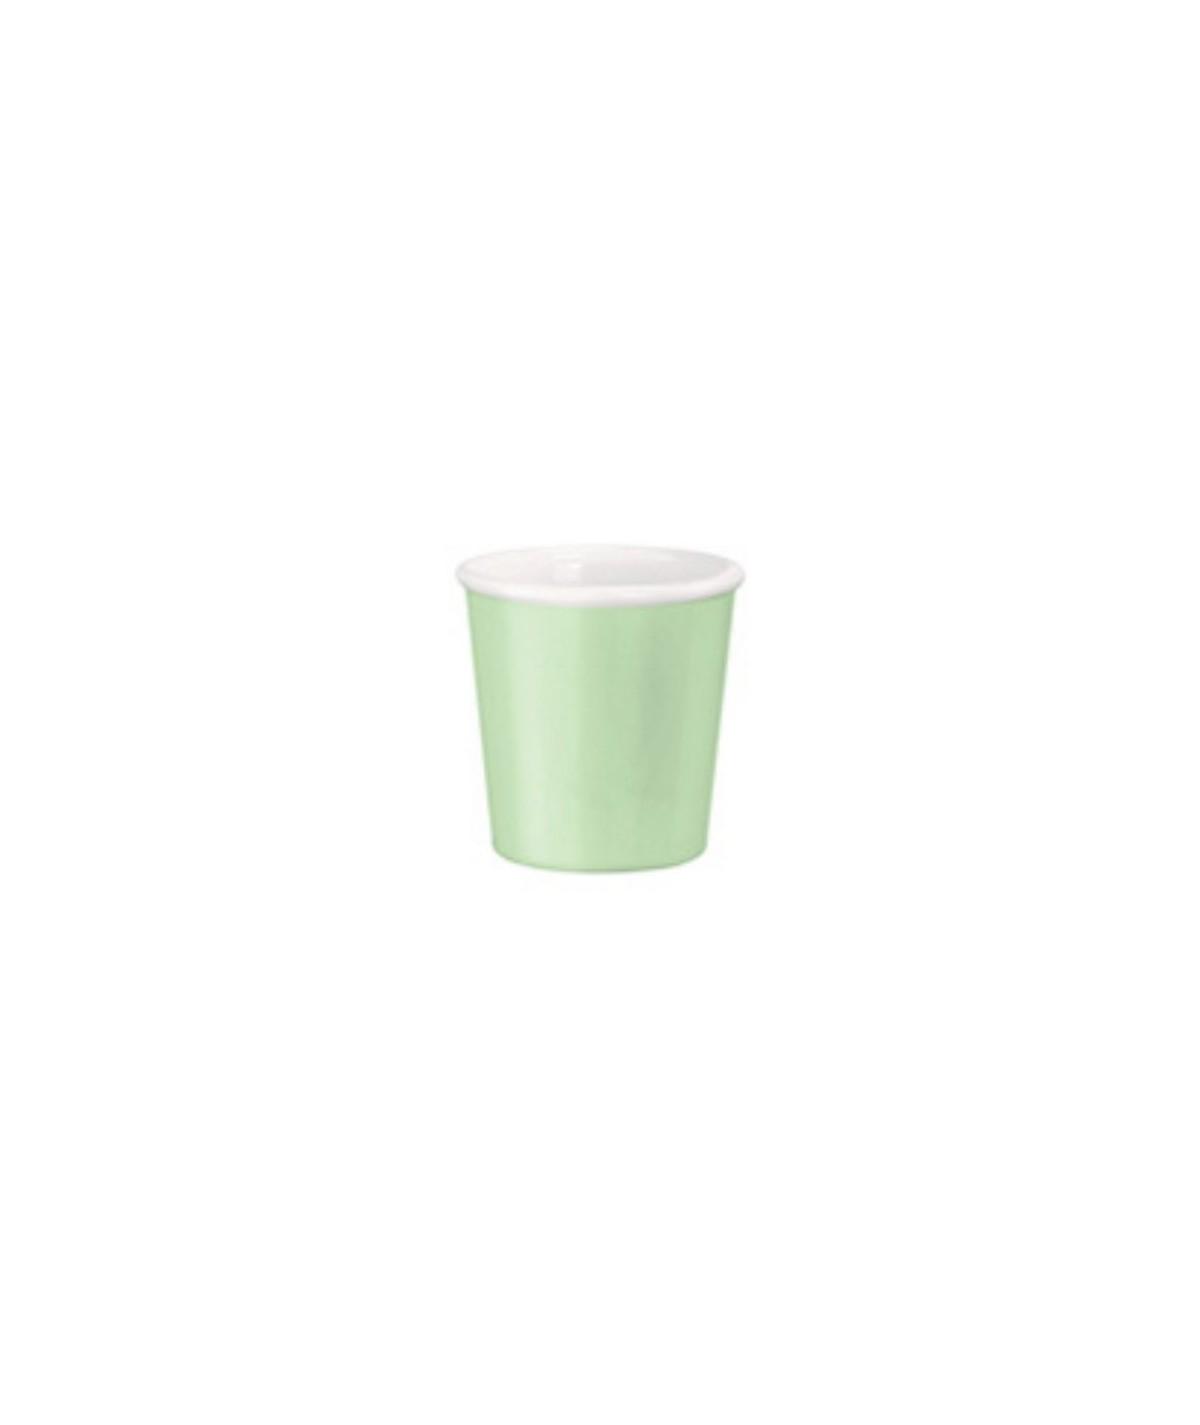 Tazzine caffè verdi...